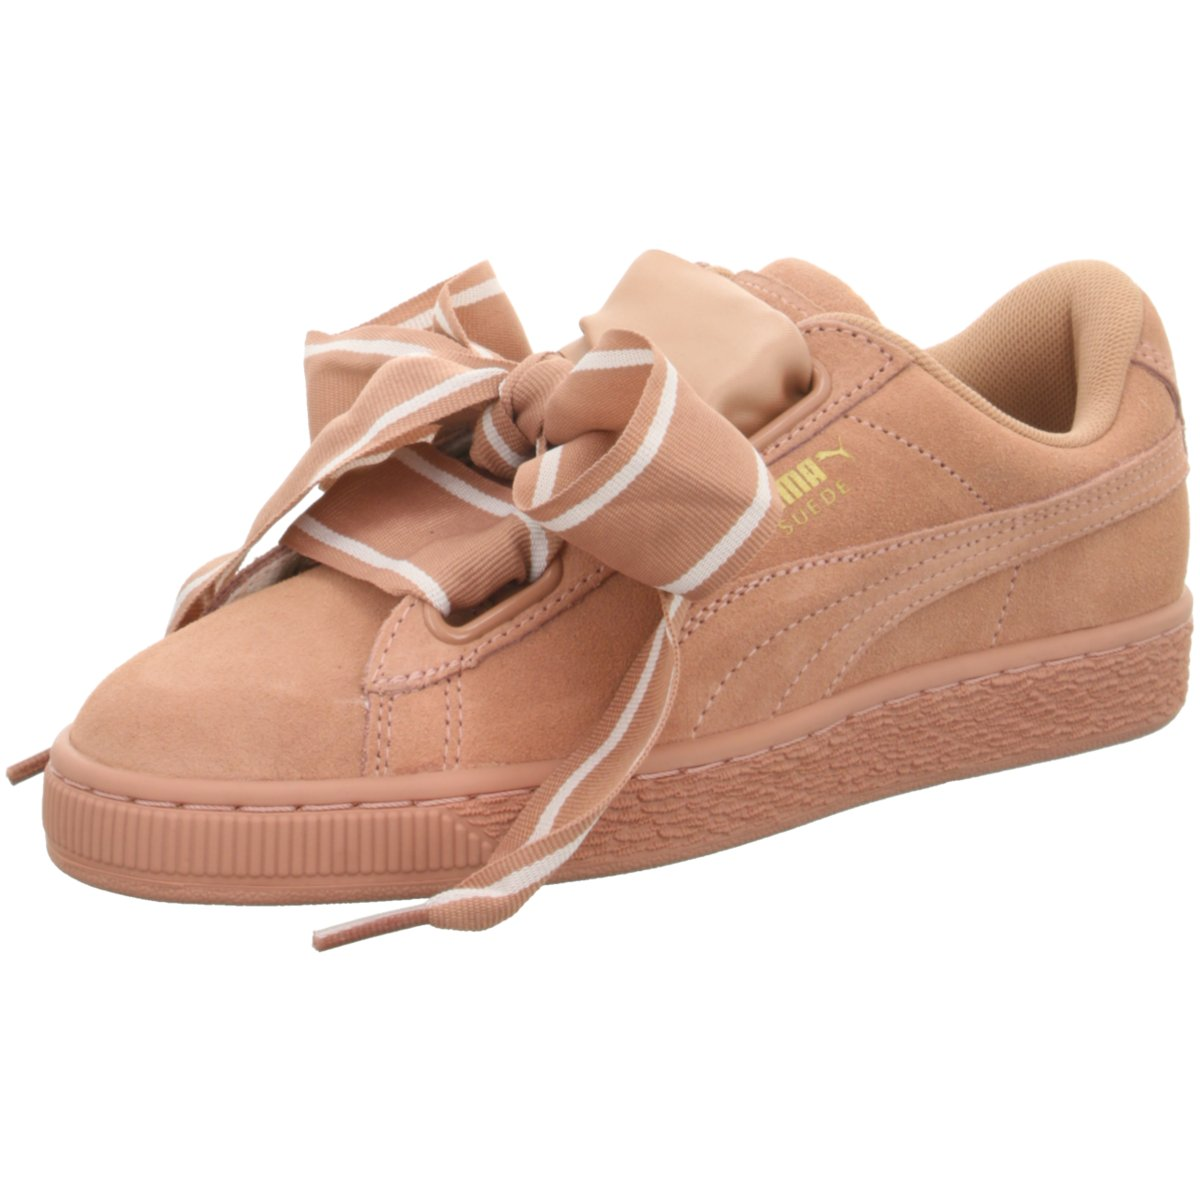 Details zu #S2K Puma Damen Sneaker Suede Heart Satin II Sneaker Damen Schuhe Cameo Brown